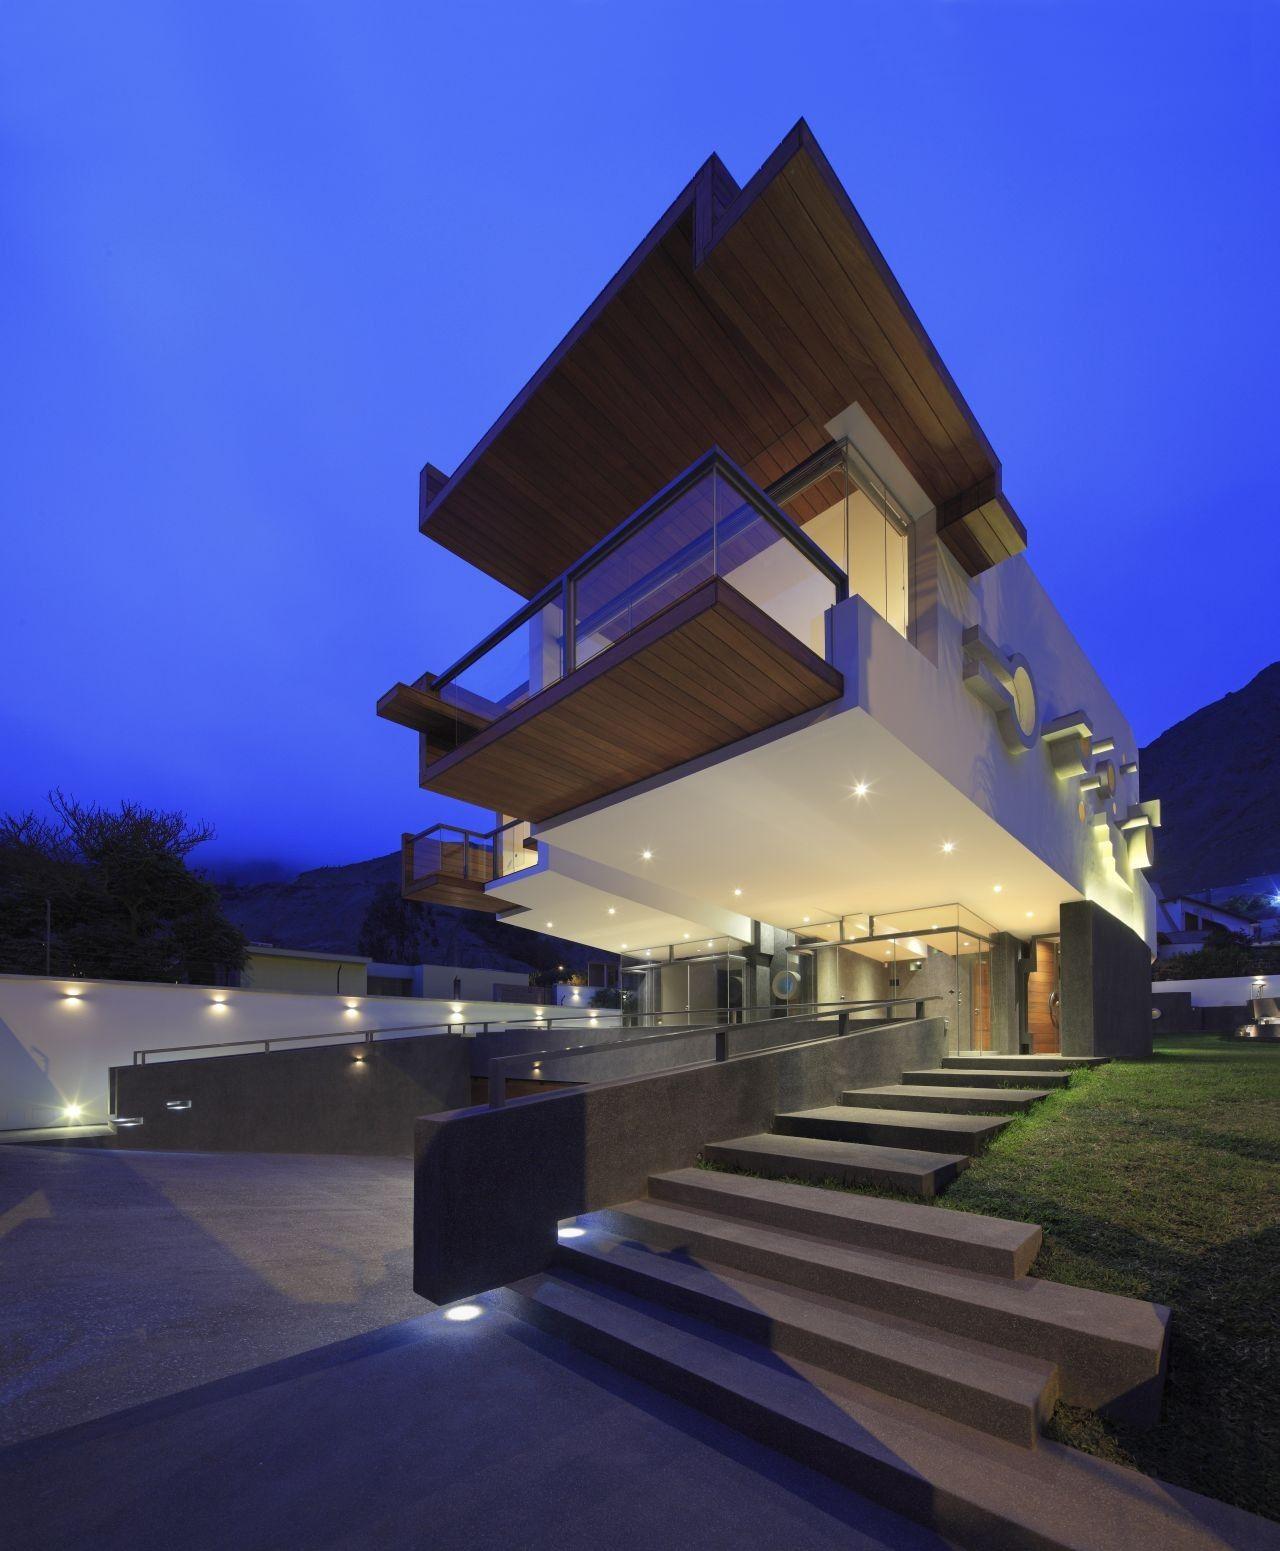 Galería De A House Forever / Longhi Architects